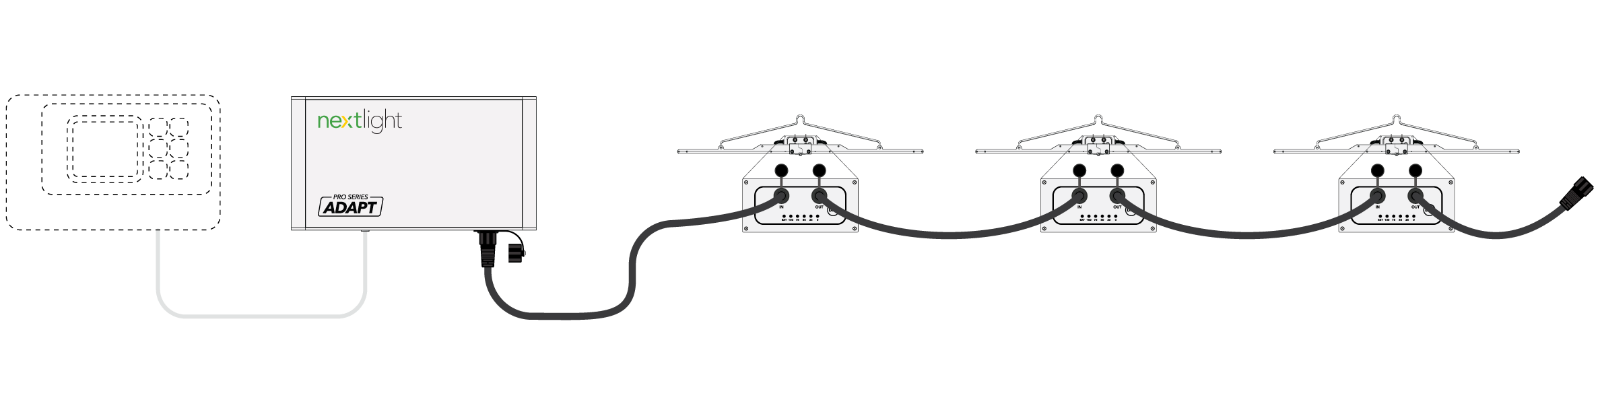 NextLight Adapt Pro Lighting System Chain